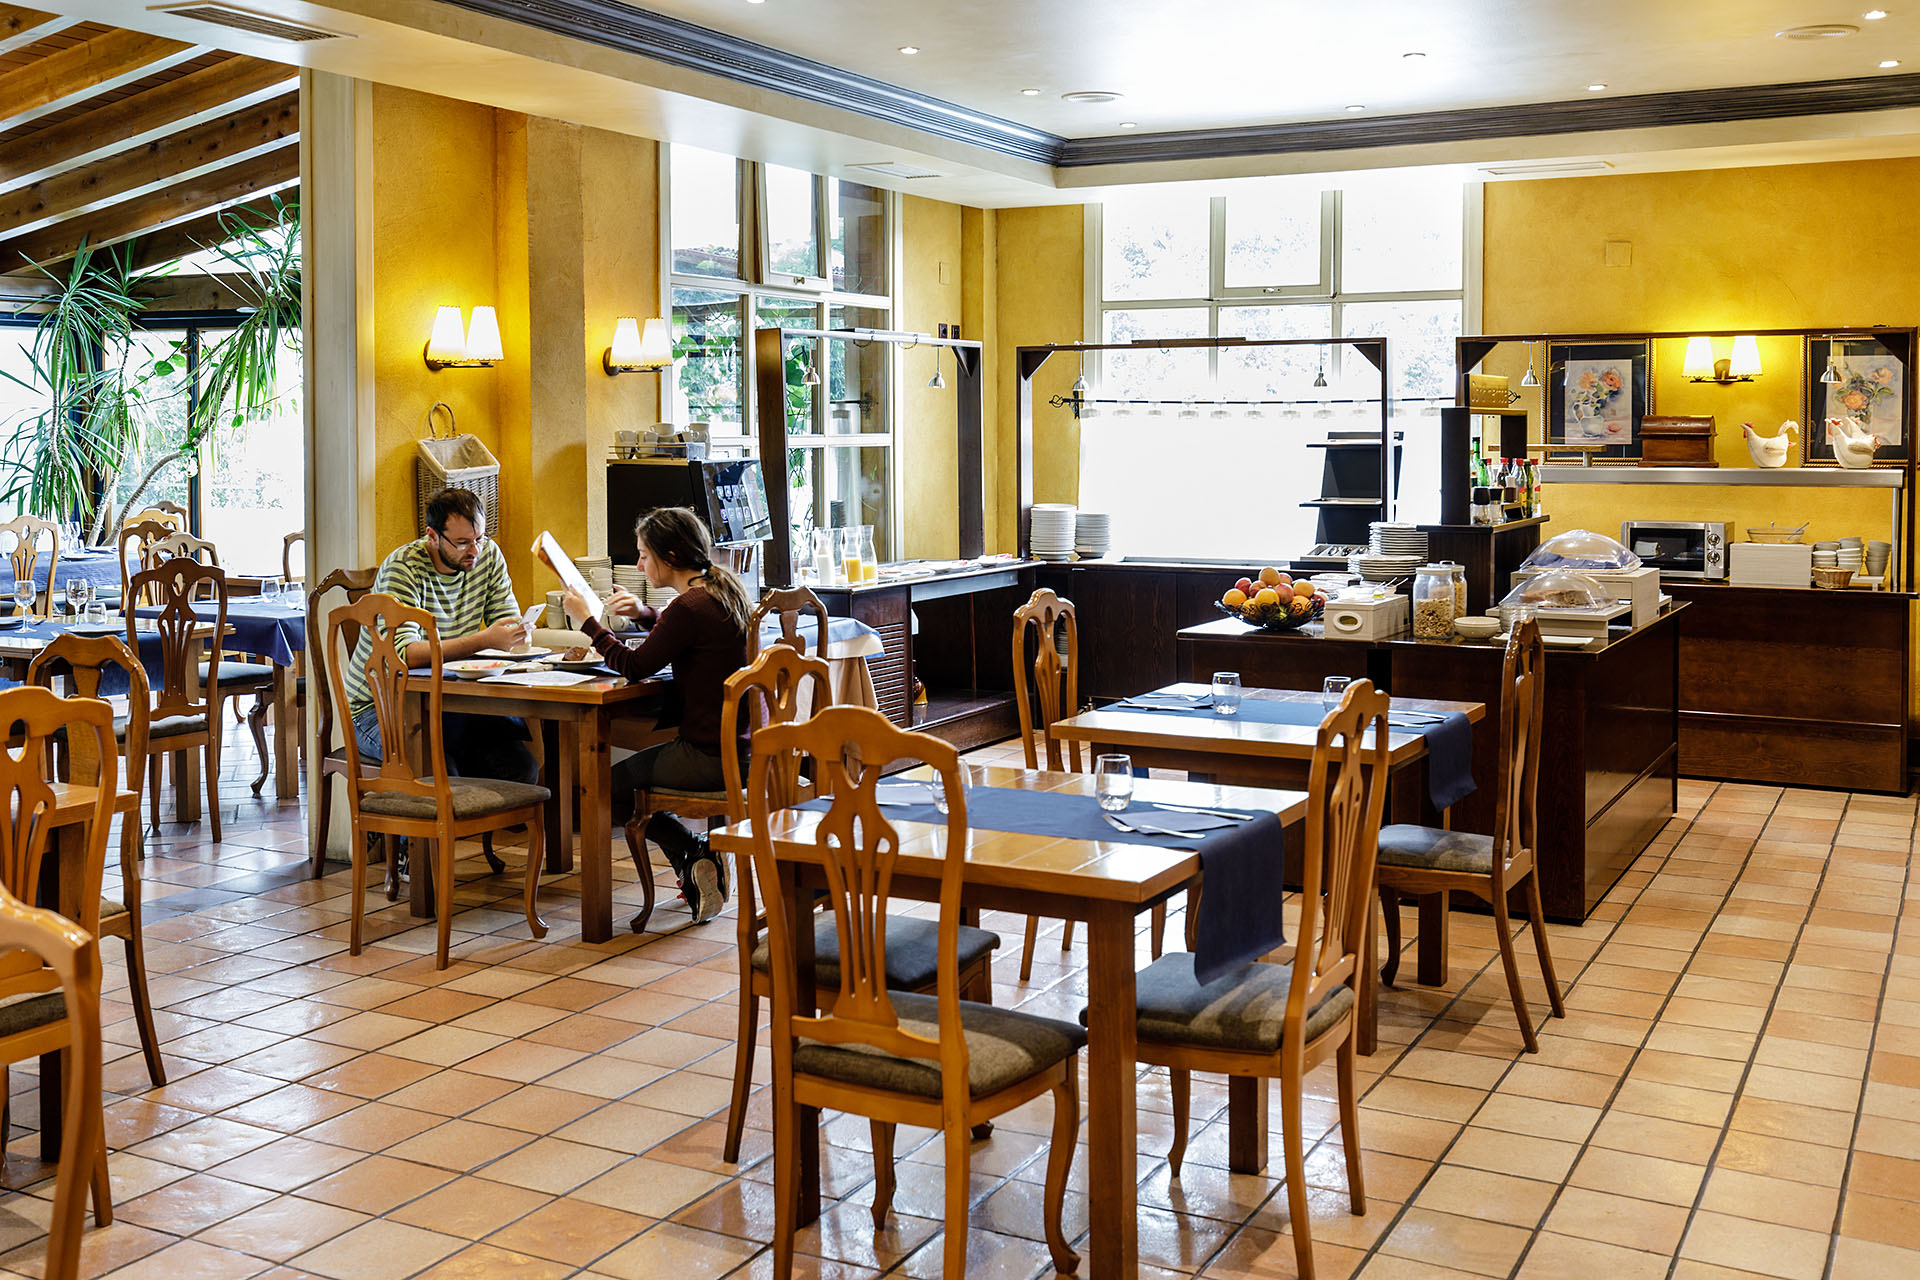 Restaurante En El Hotel Jakue Irunbidea S N Puente